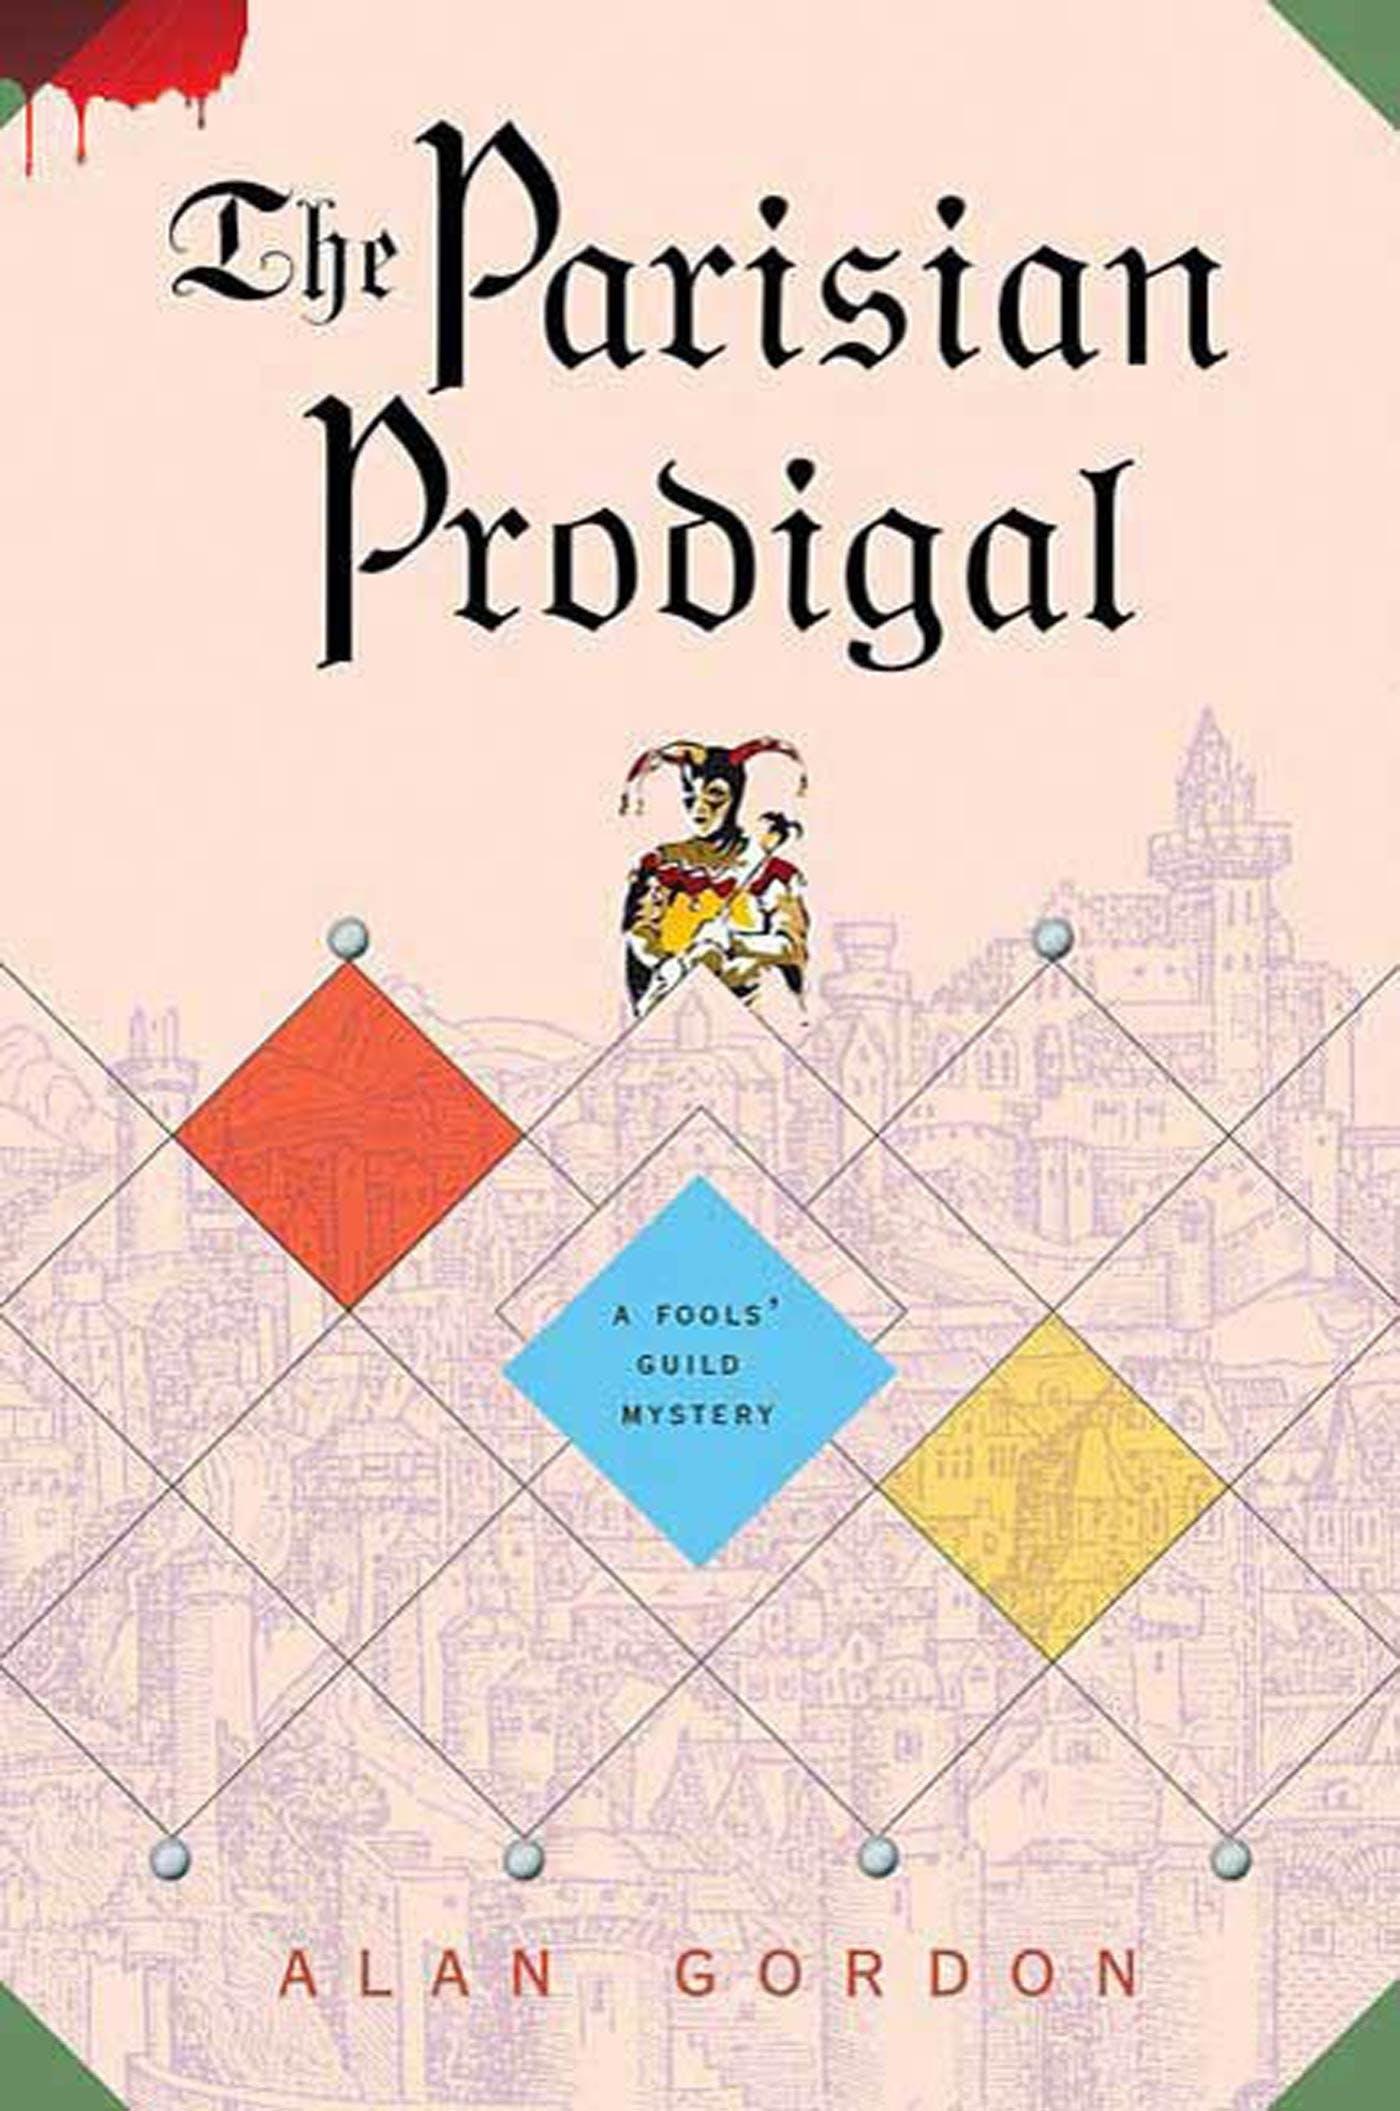 Image of The Parisian Prodigal